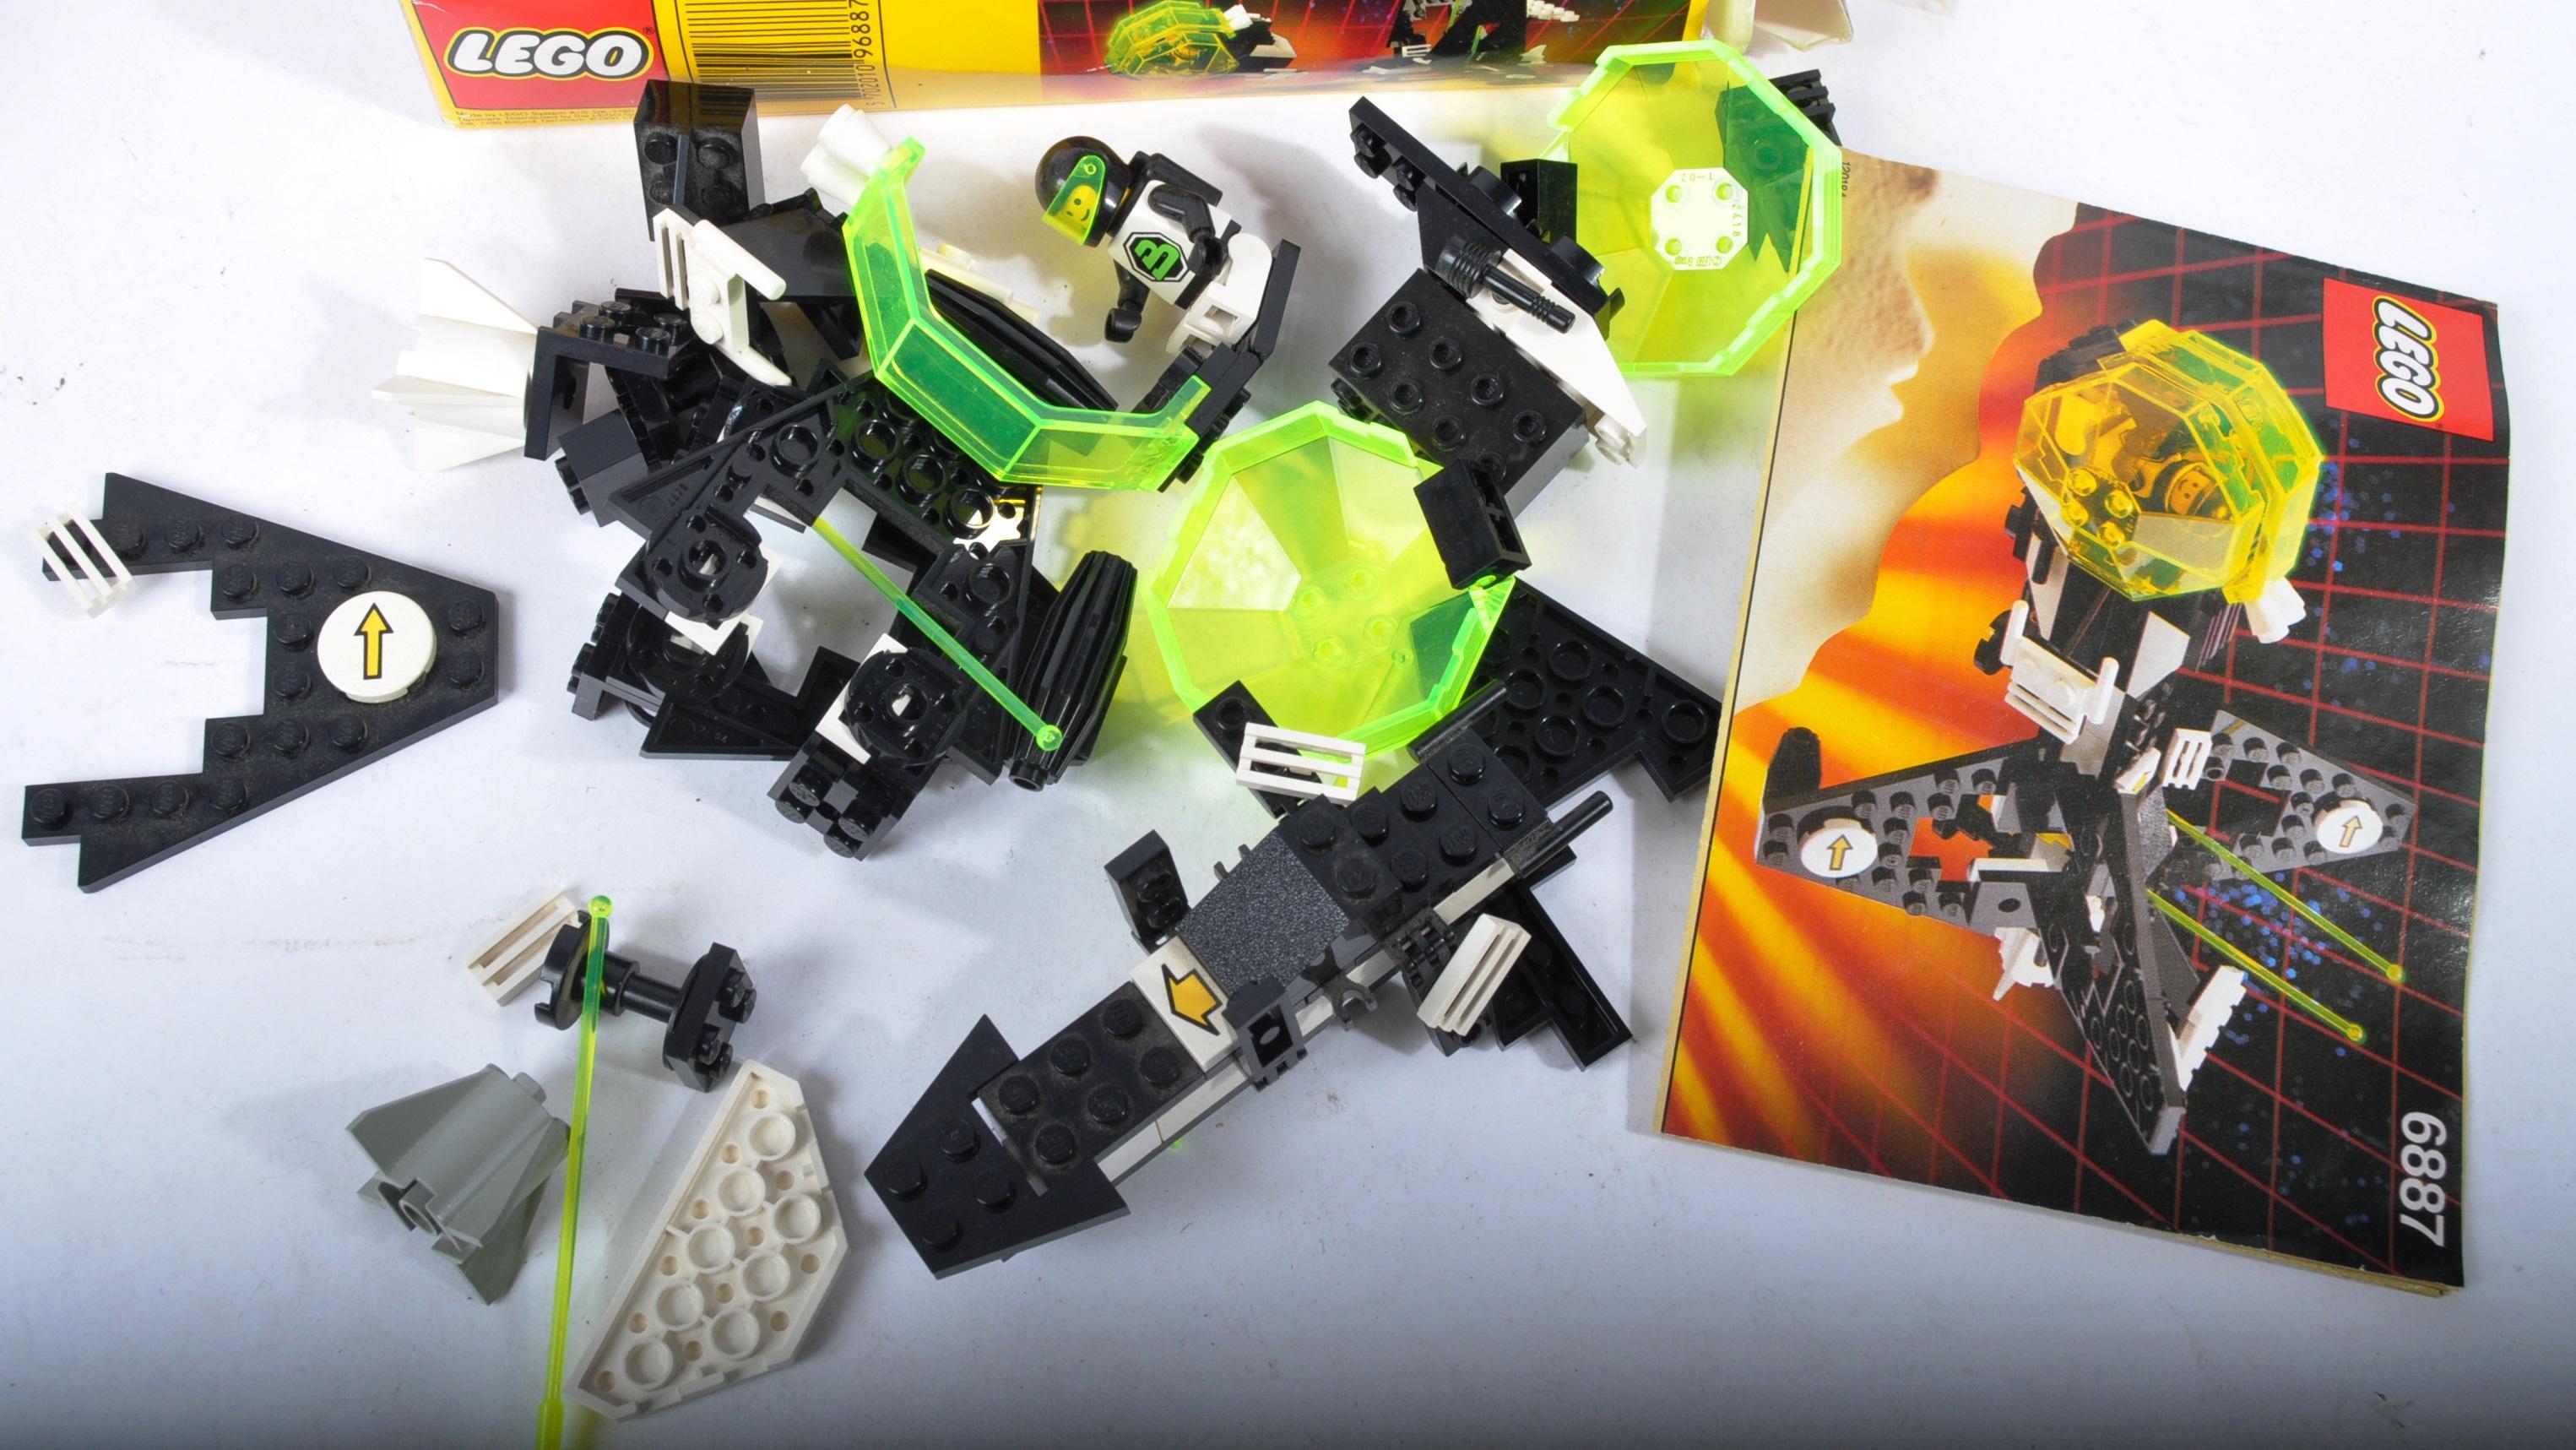 LEGO SETS - BLACKTRON - 6832 / 6833 / 6851 / 6878 / 6887 - Image 8 of 10